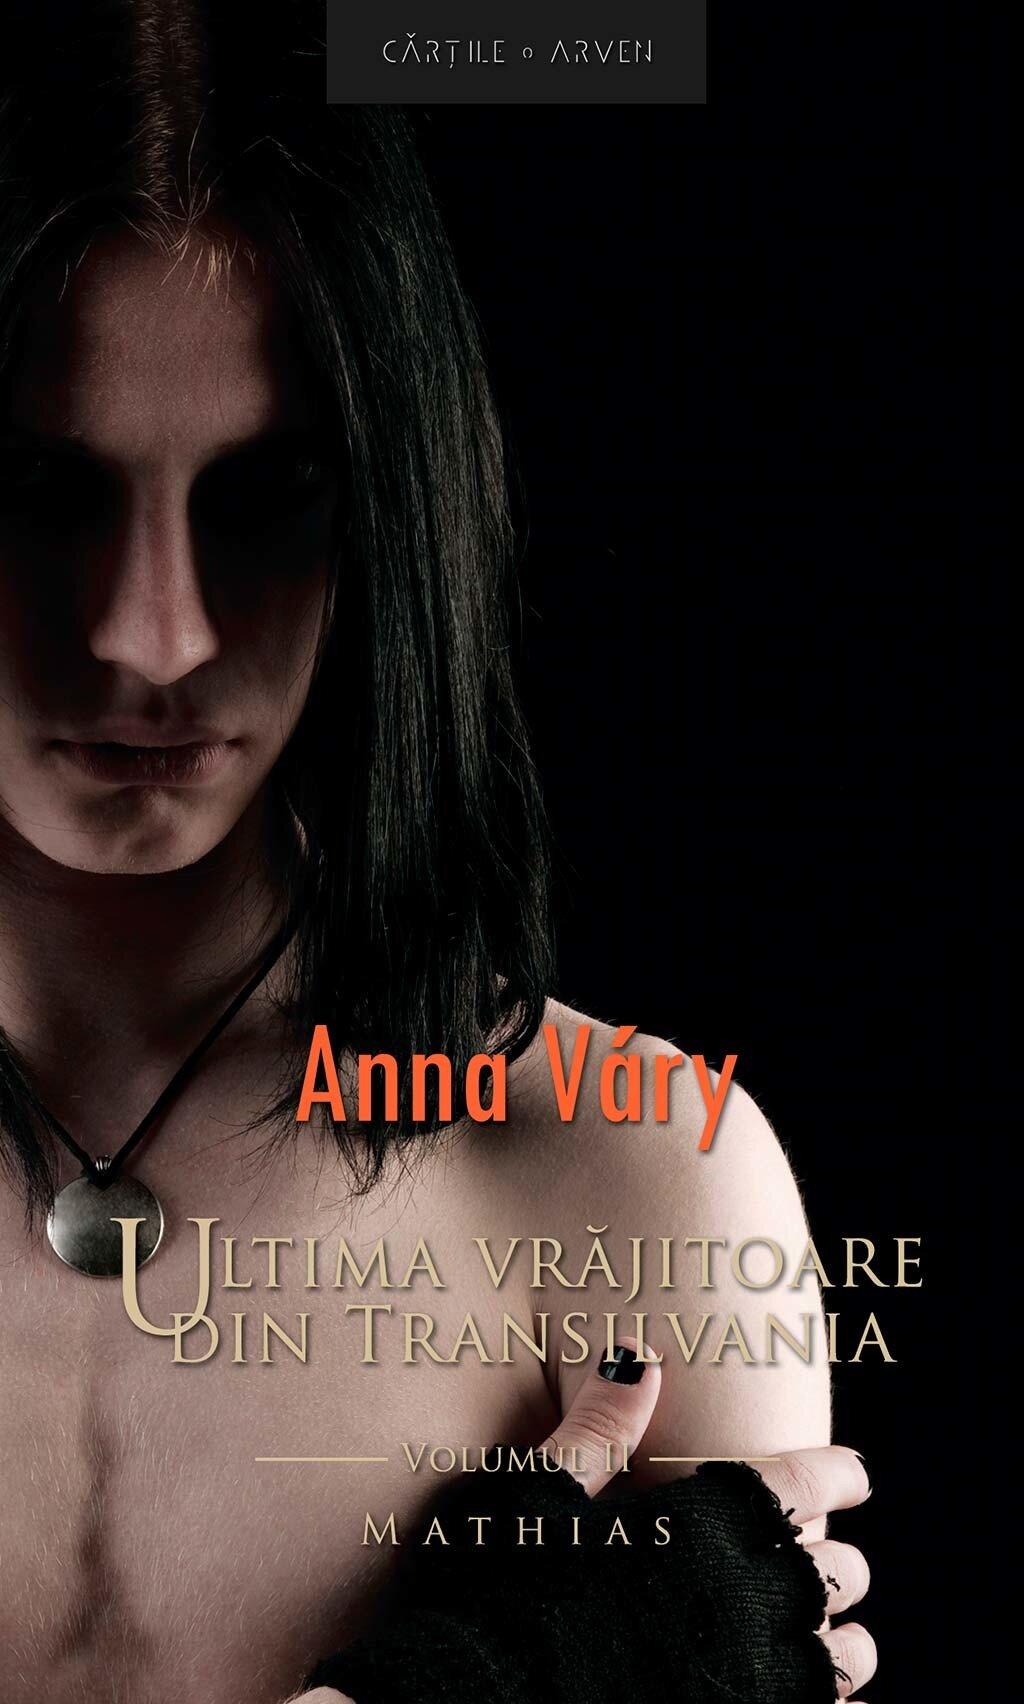 Ultima vrajitoare din Transilvania. Vol. 2 - Mathias (eBook)